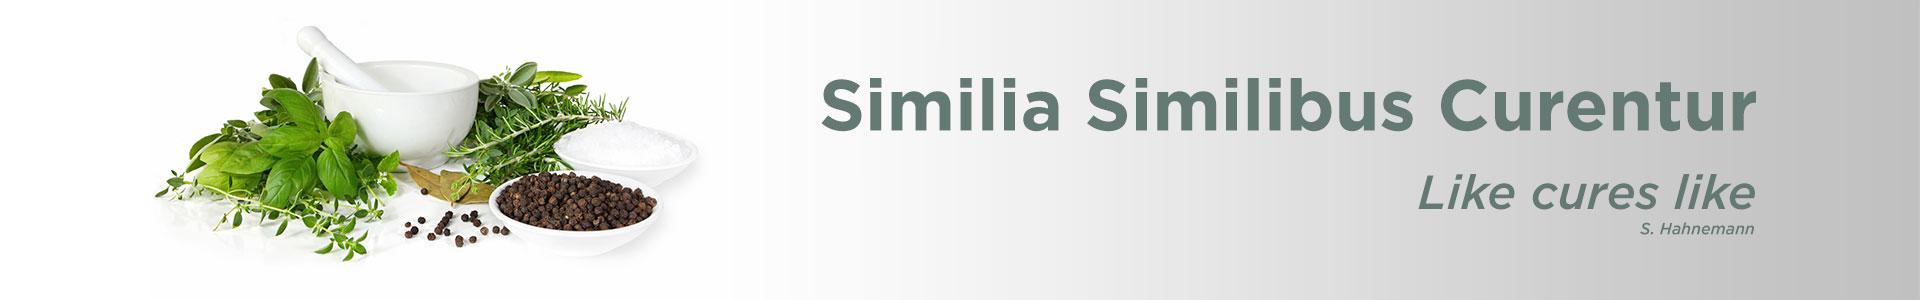 Homeopathy page image. Similia Silimibus Curentur. Like cure like. S. Hahnemann. Dr. Emel Gokmen